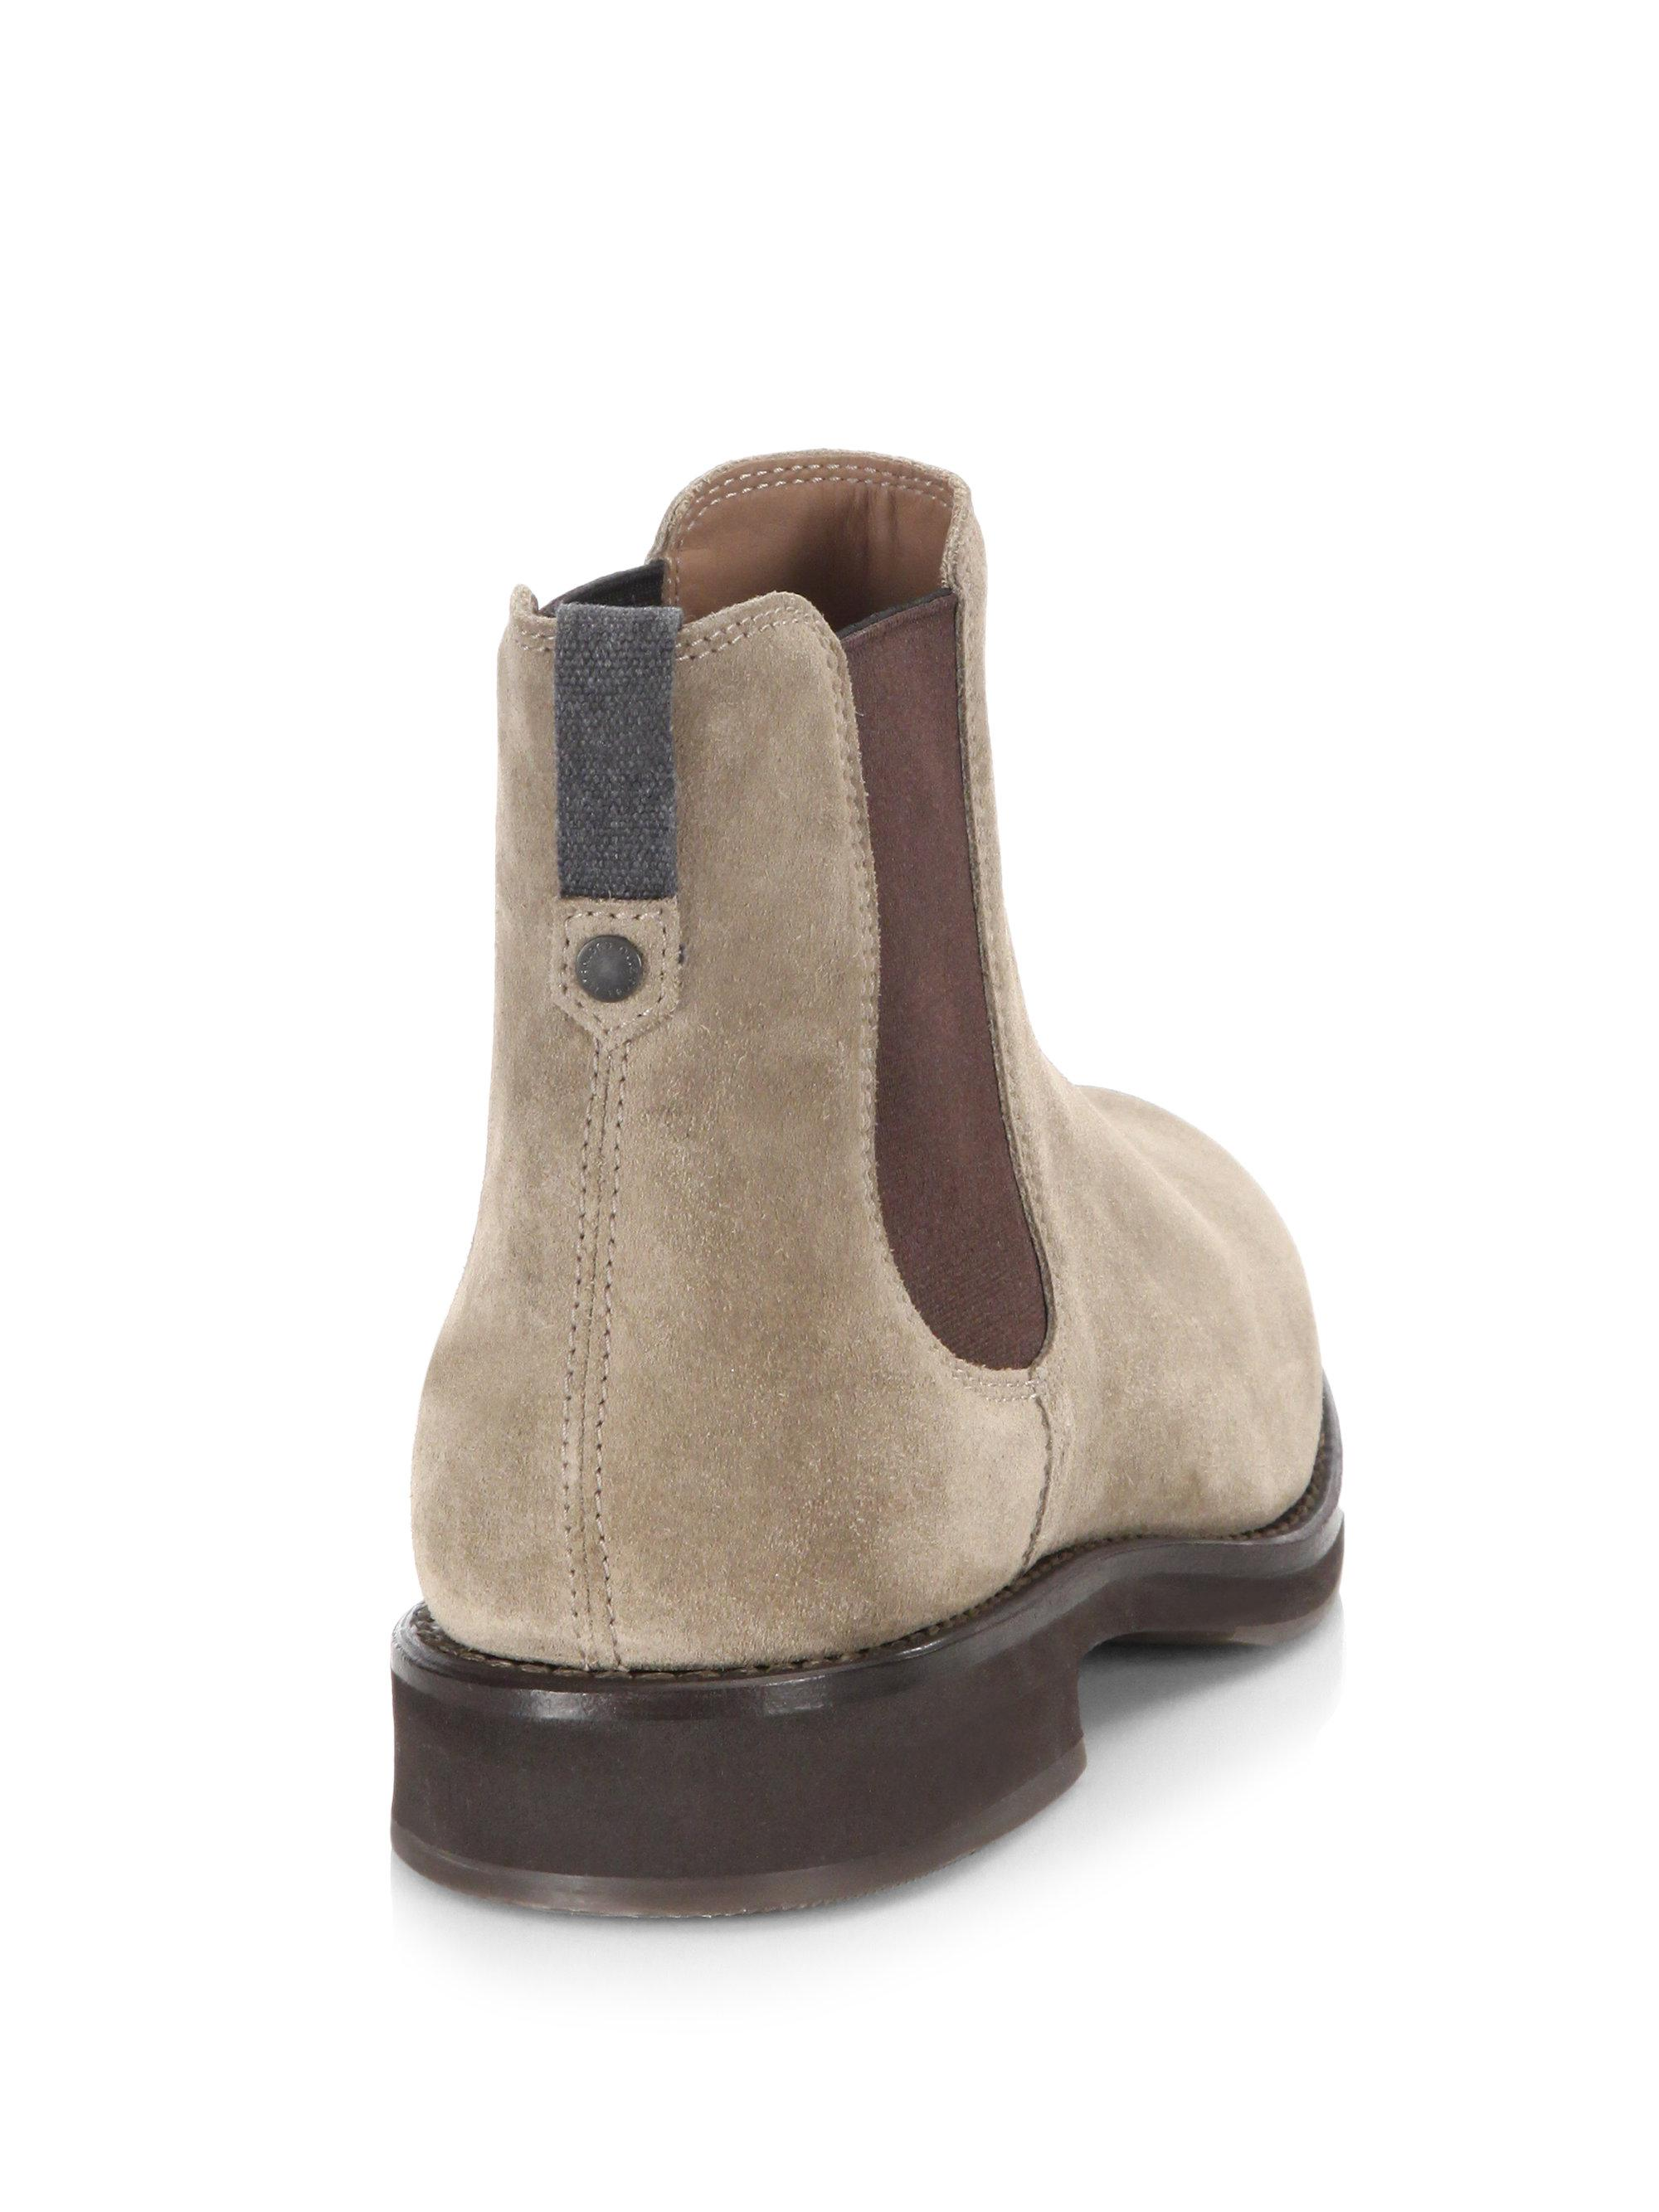 Brunello Cucinelli Two-Tone Suede Chelsea Boots 6jag6QL